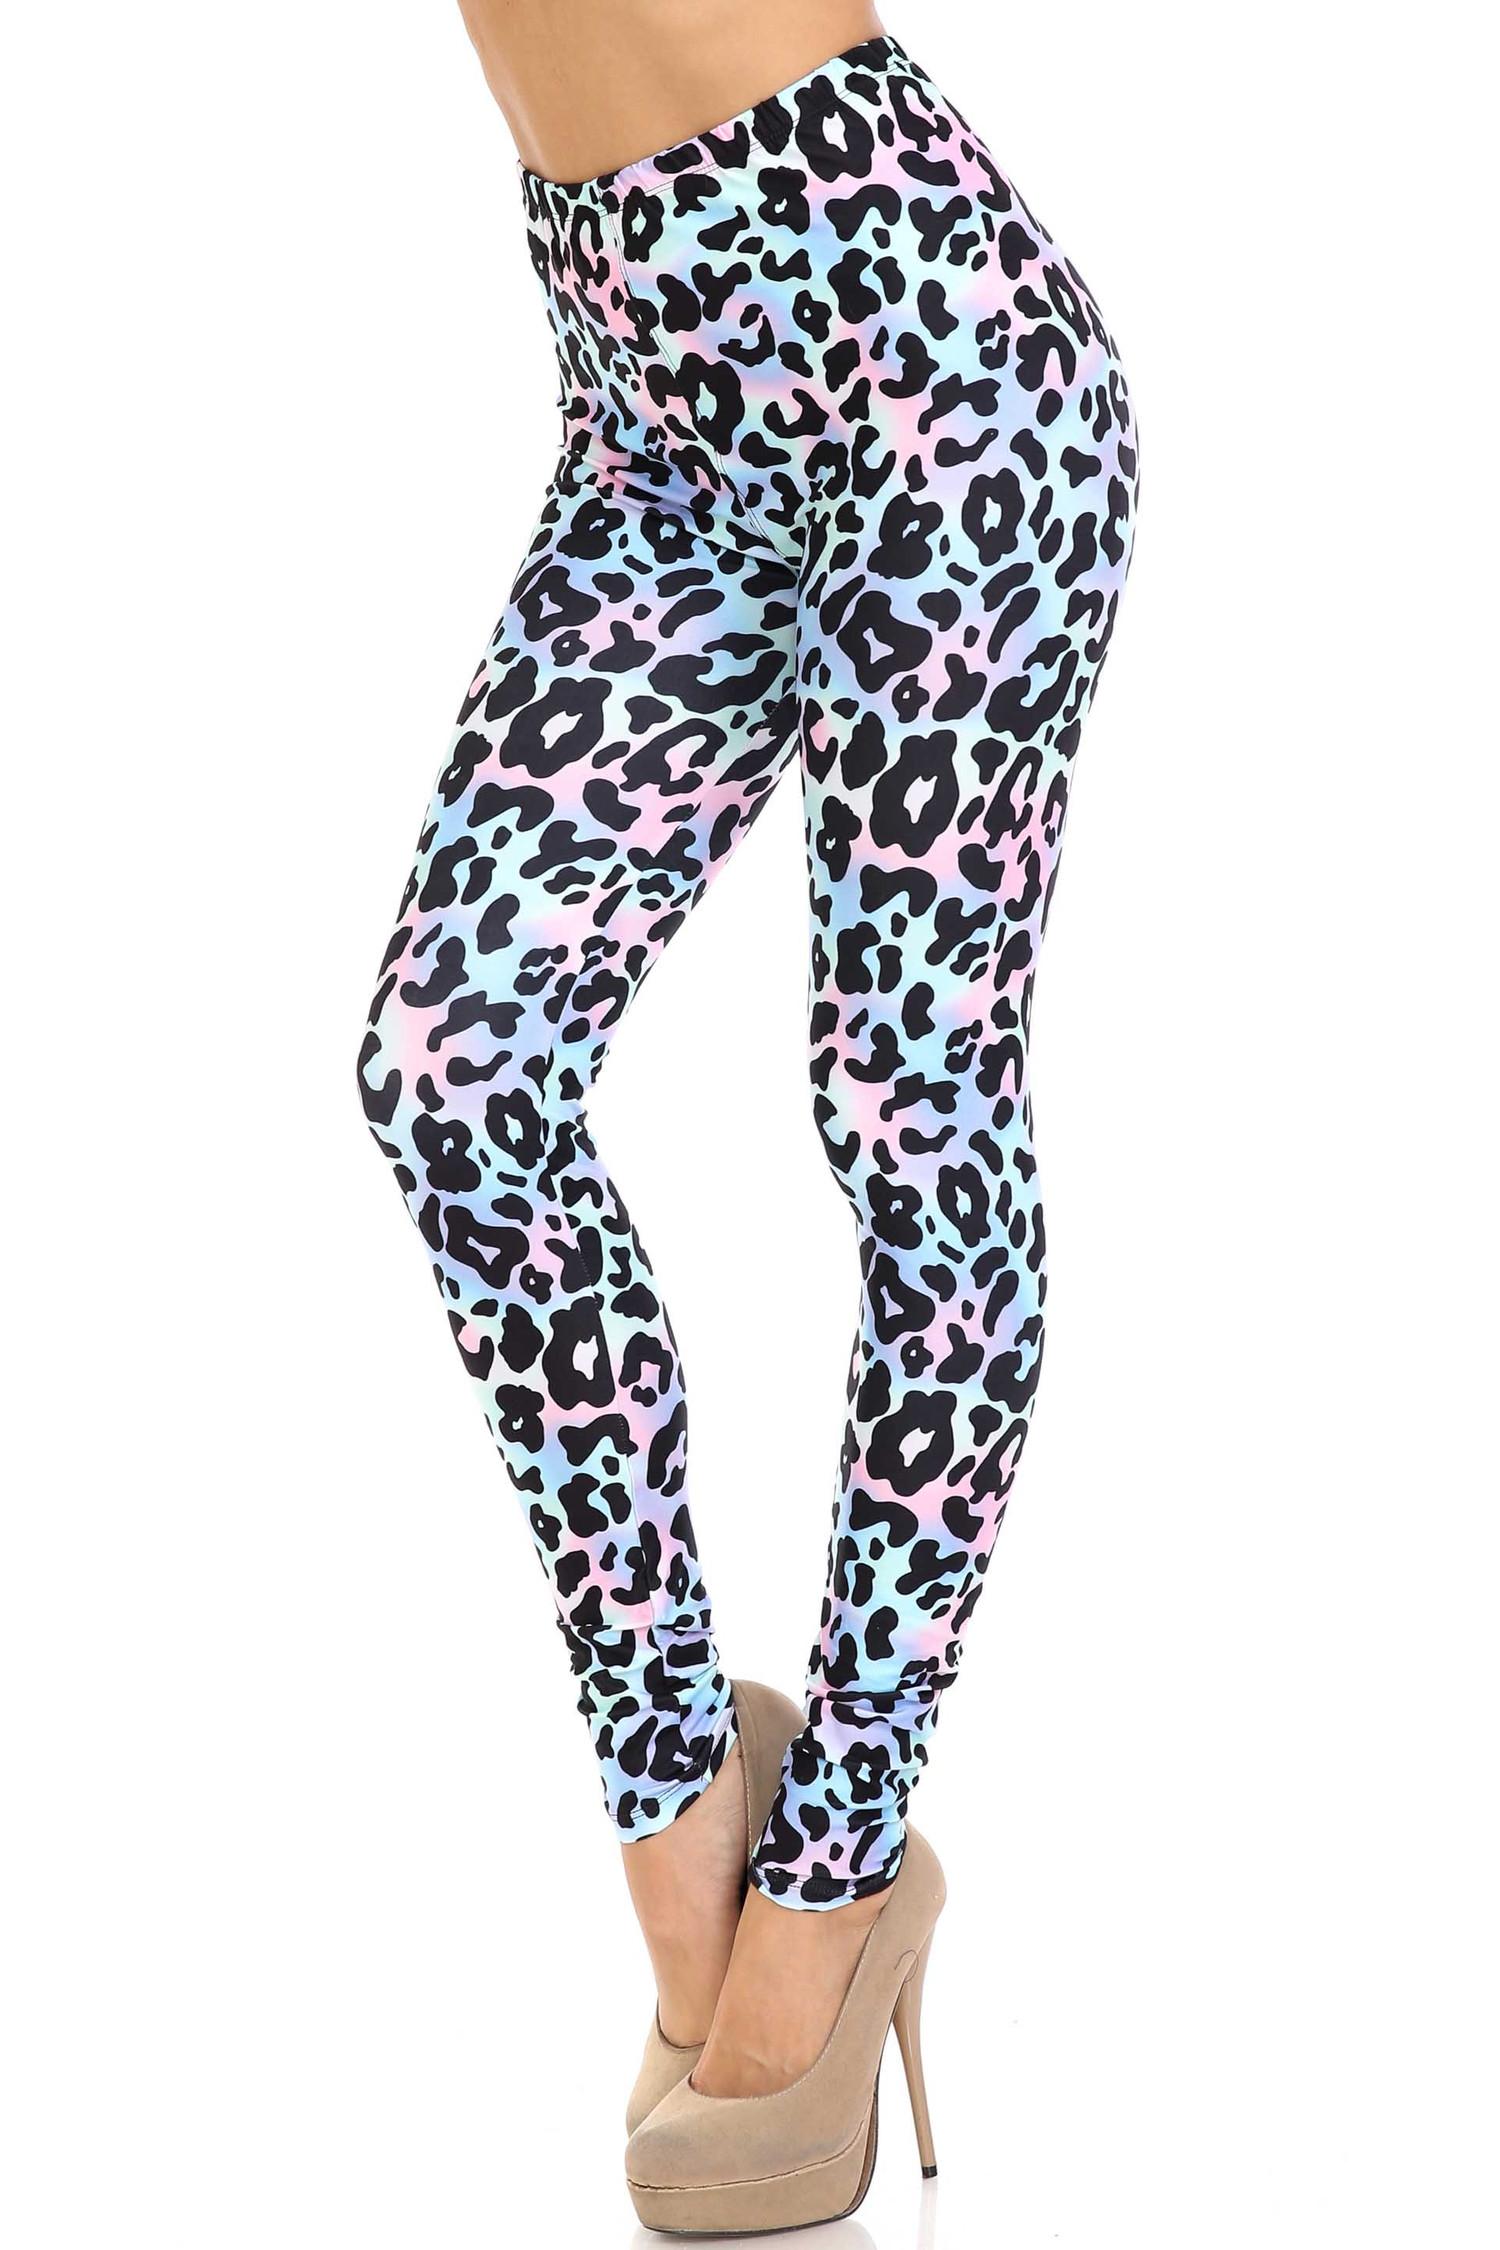 Creamy Soft Chromatic Leopard Leggings - By USA Fashion™